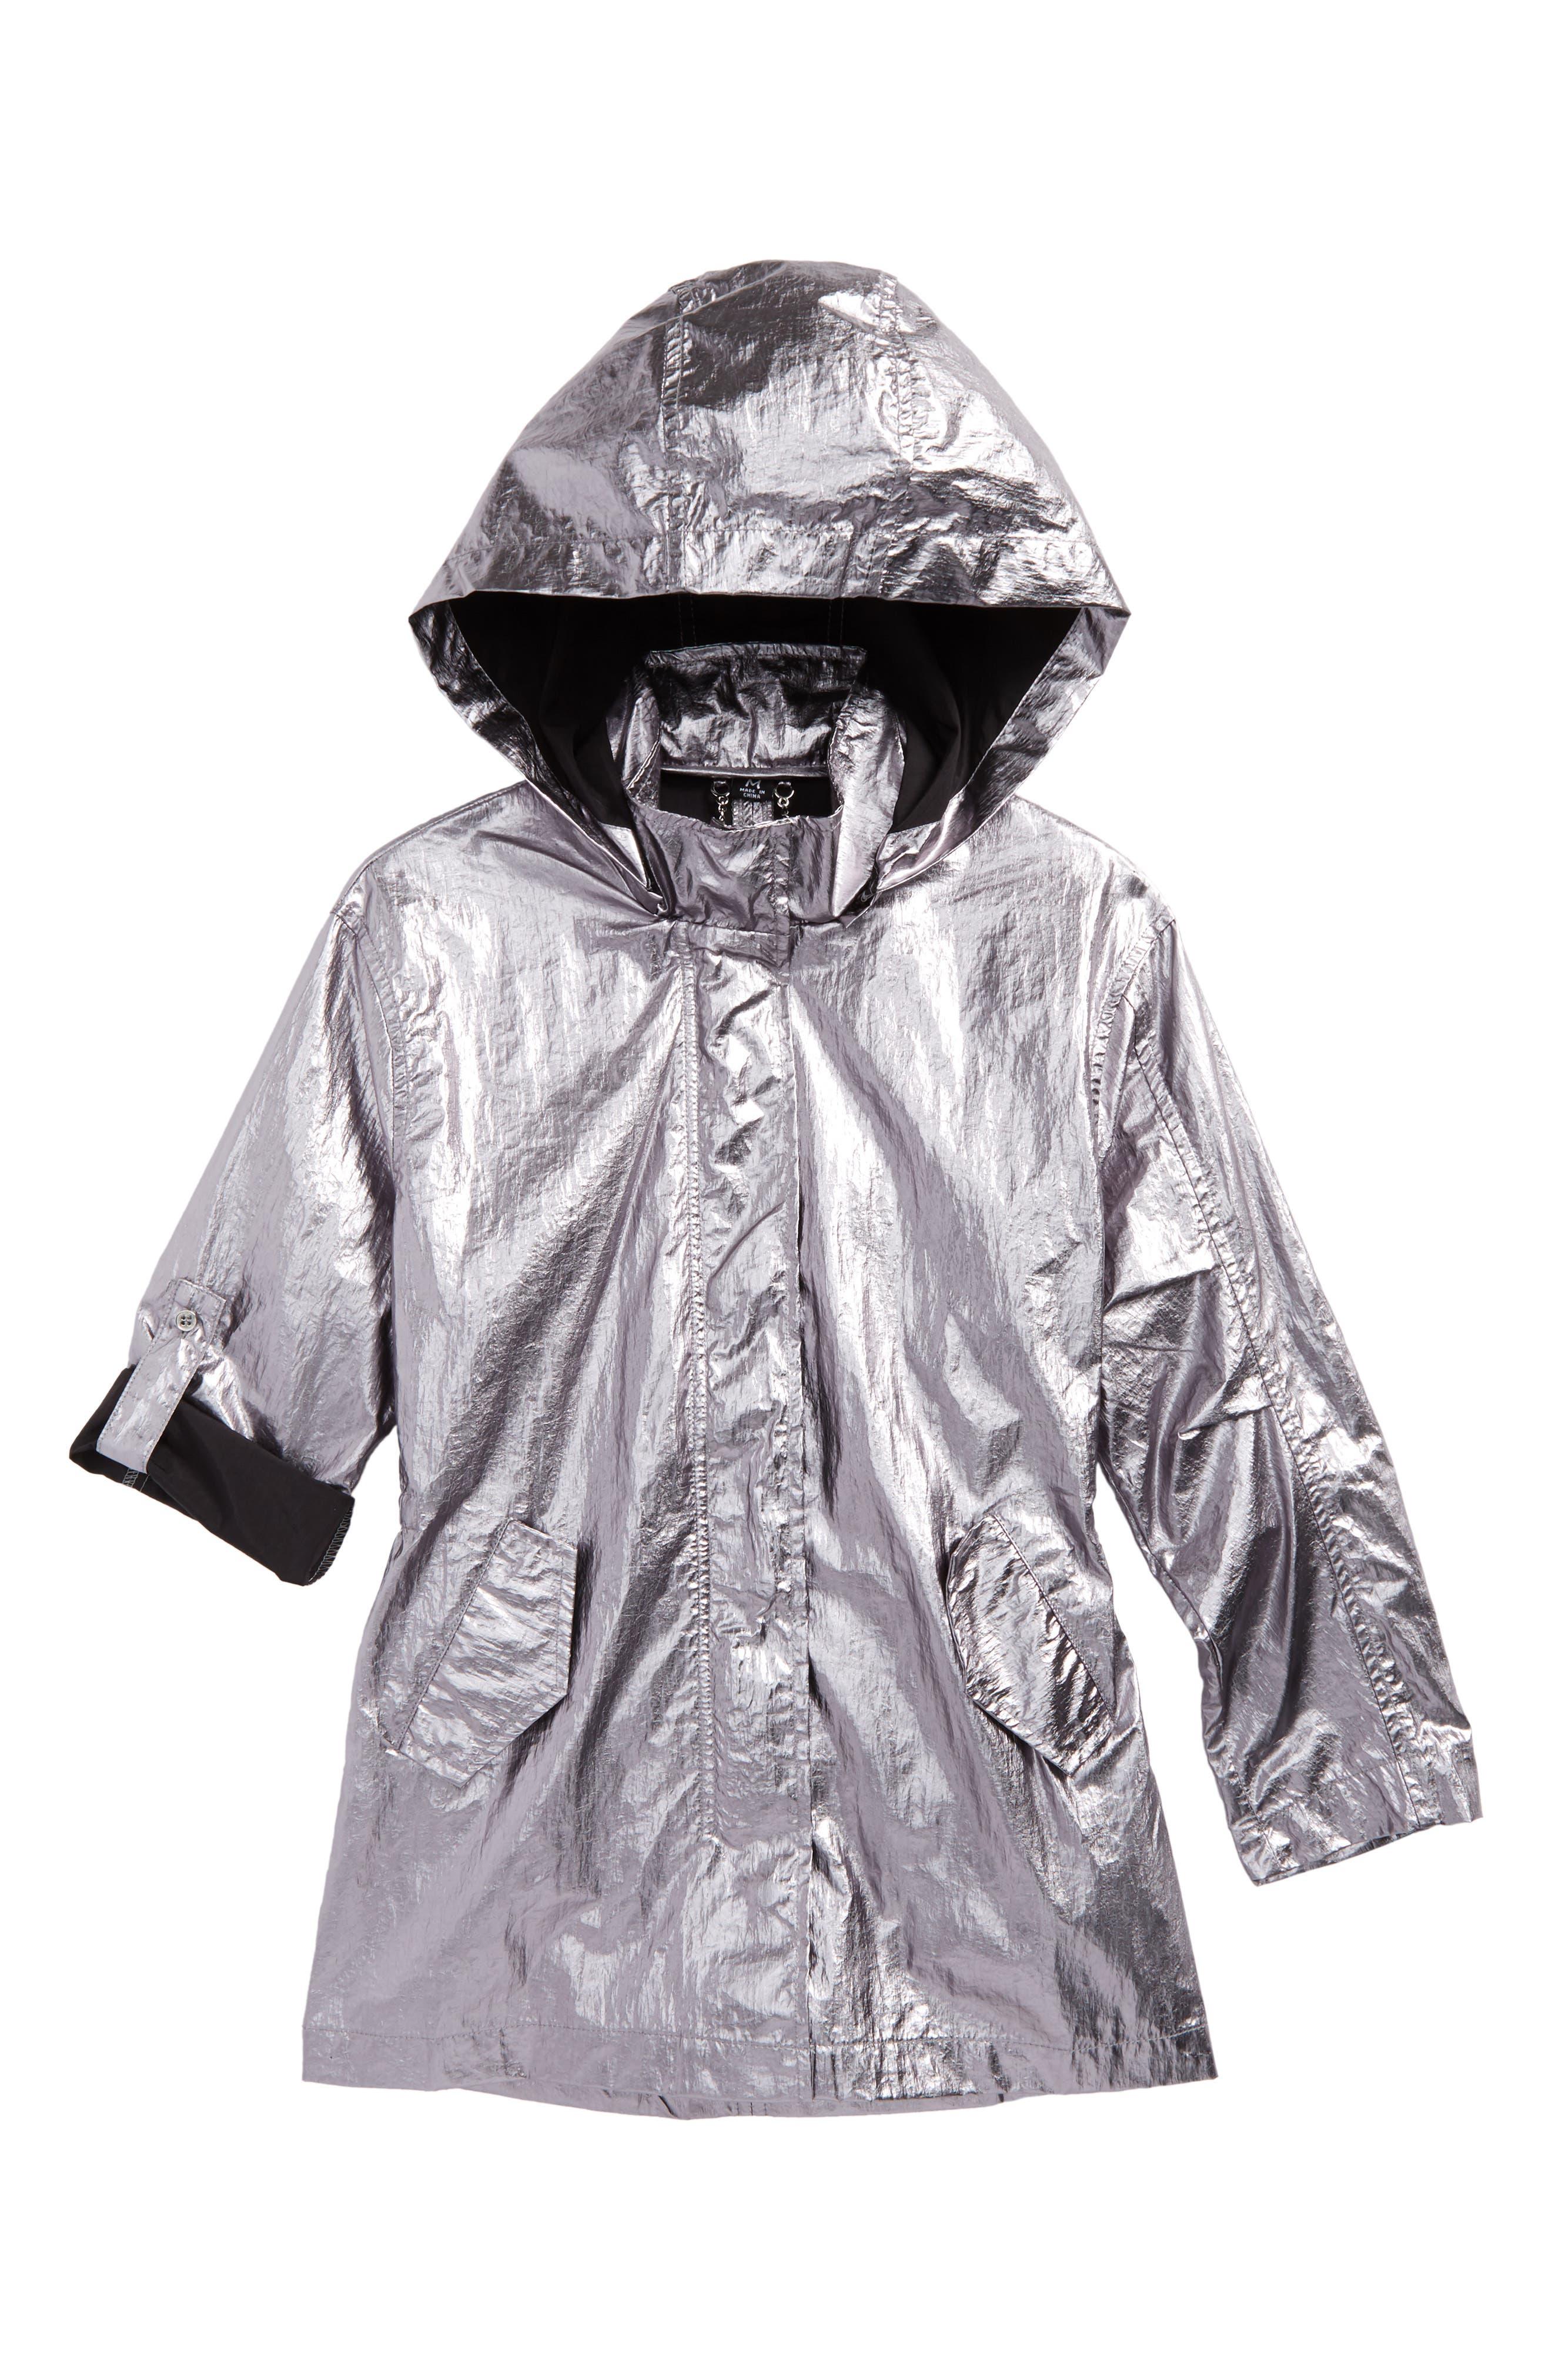 Metallic Rain Jacket,                             Main thumbnail 1, color,                             040